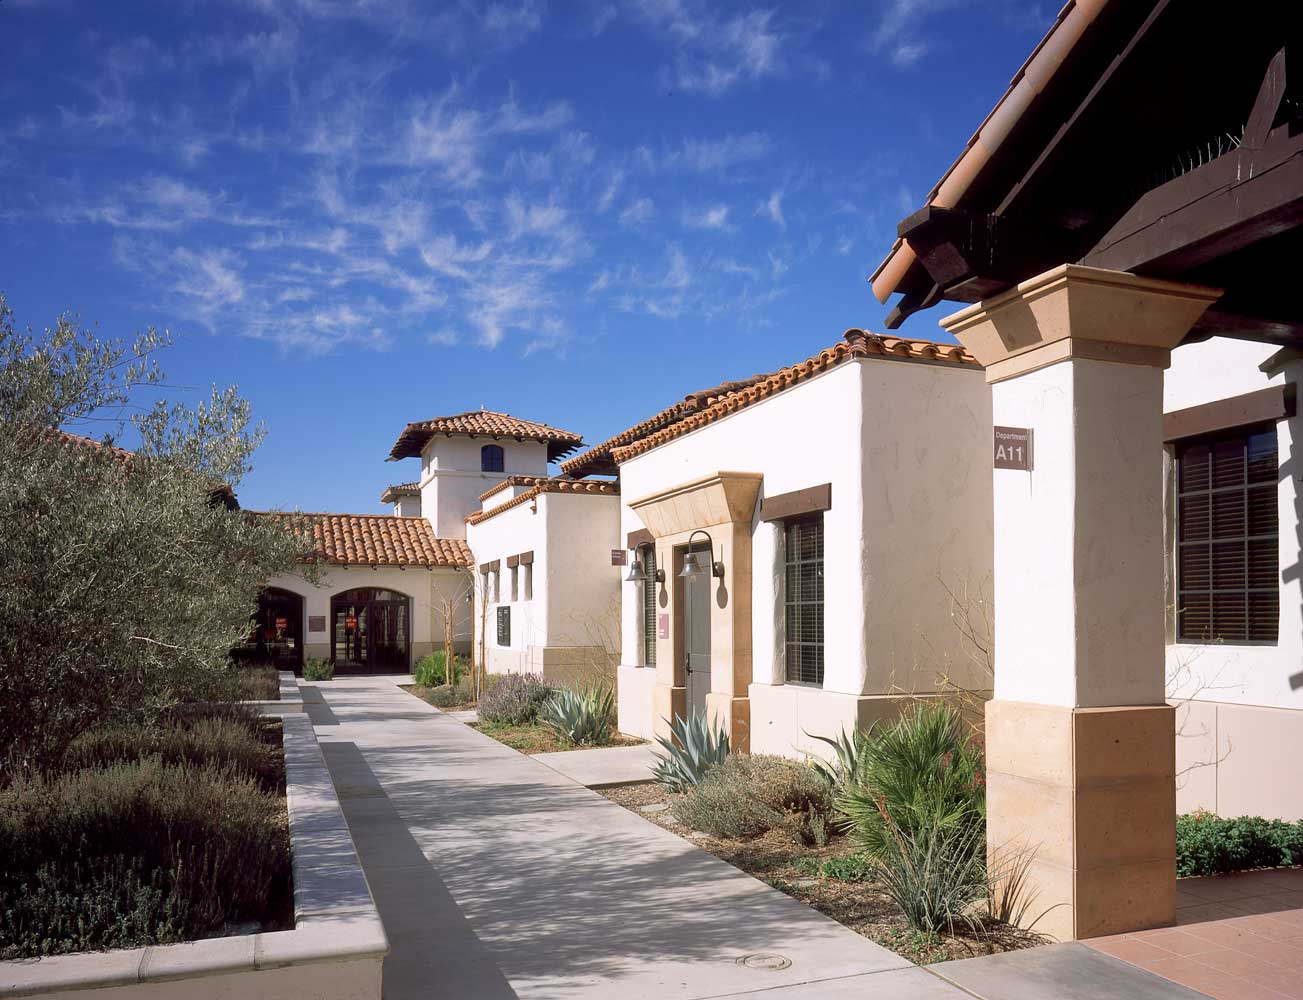 Cheap Hotels In Palmdale Ca